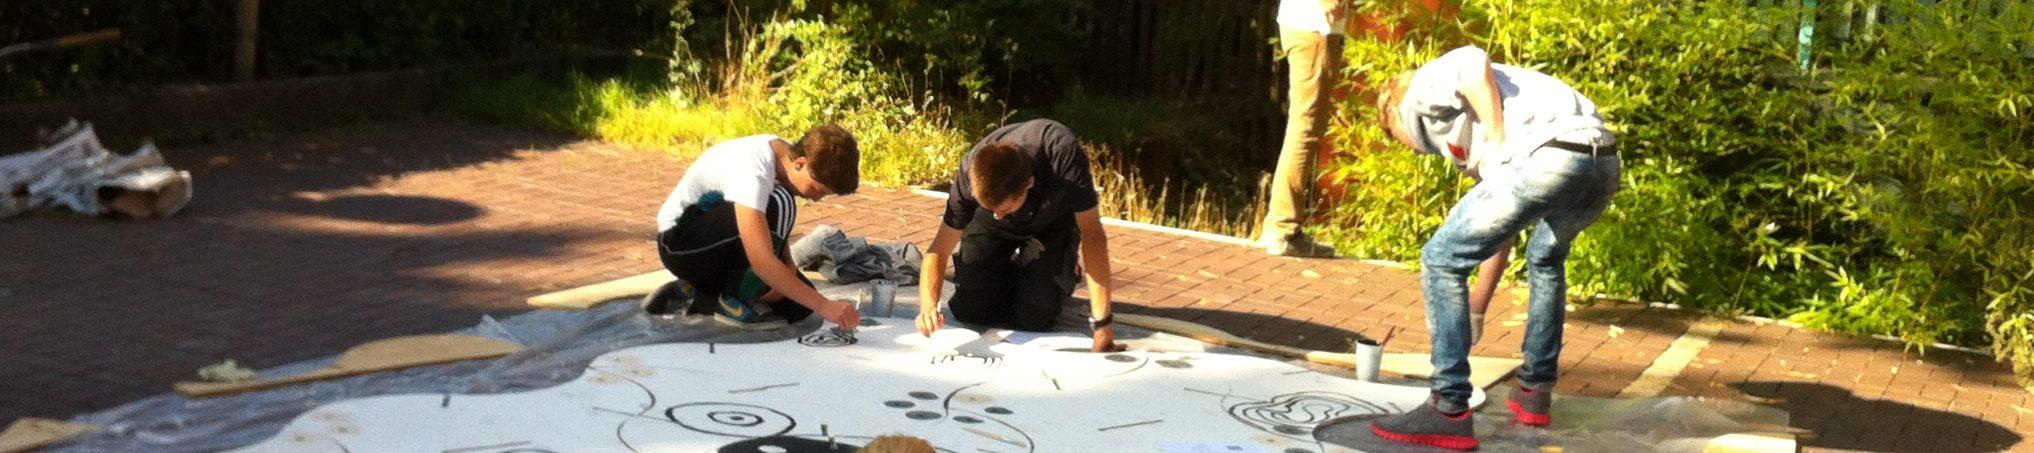 Jugendliche_Gestaltung_Teamskulptur